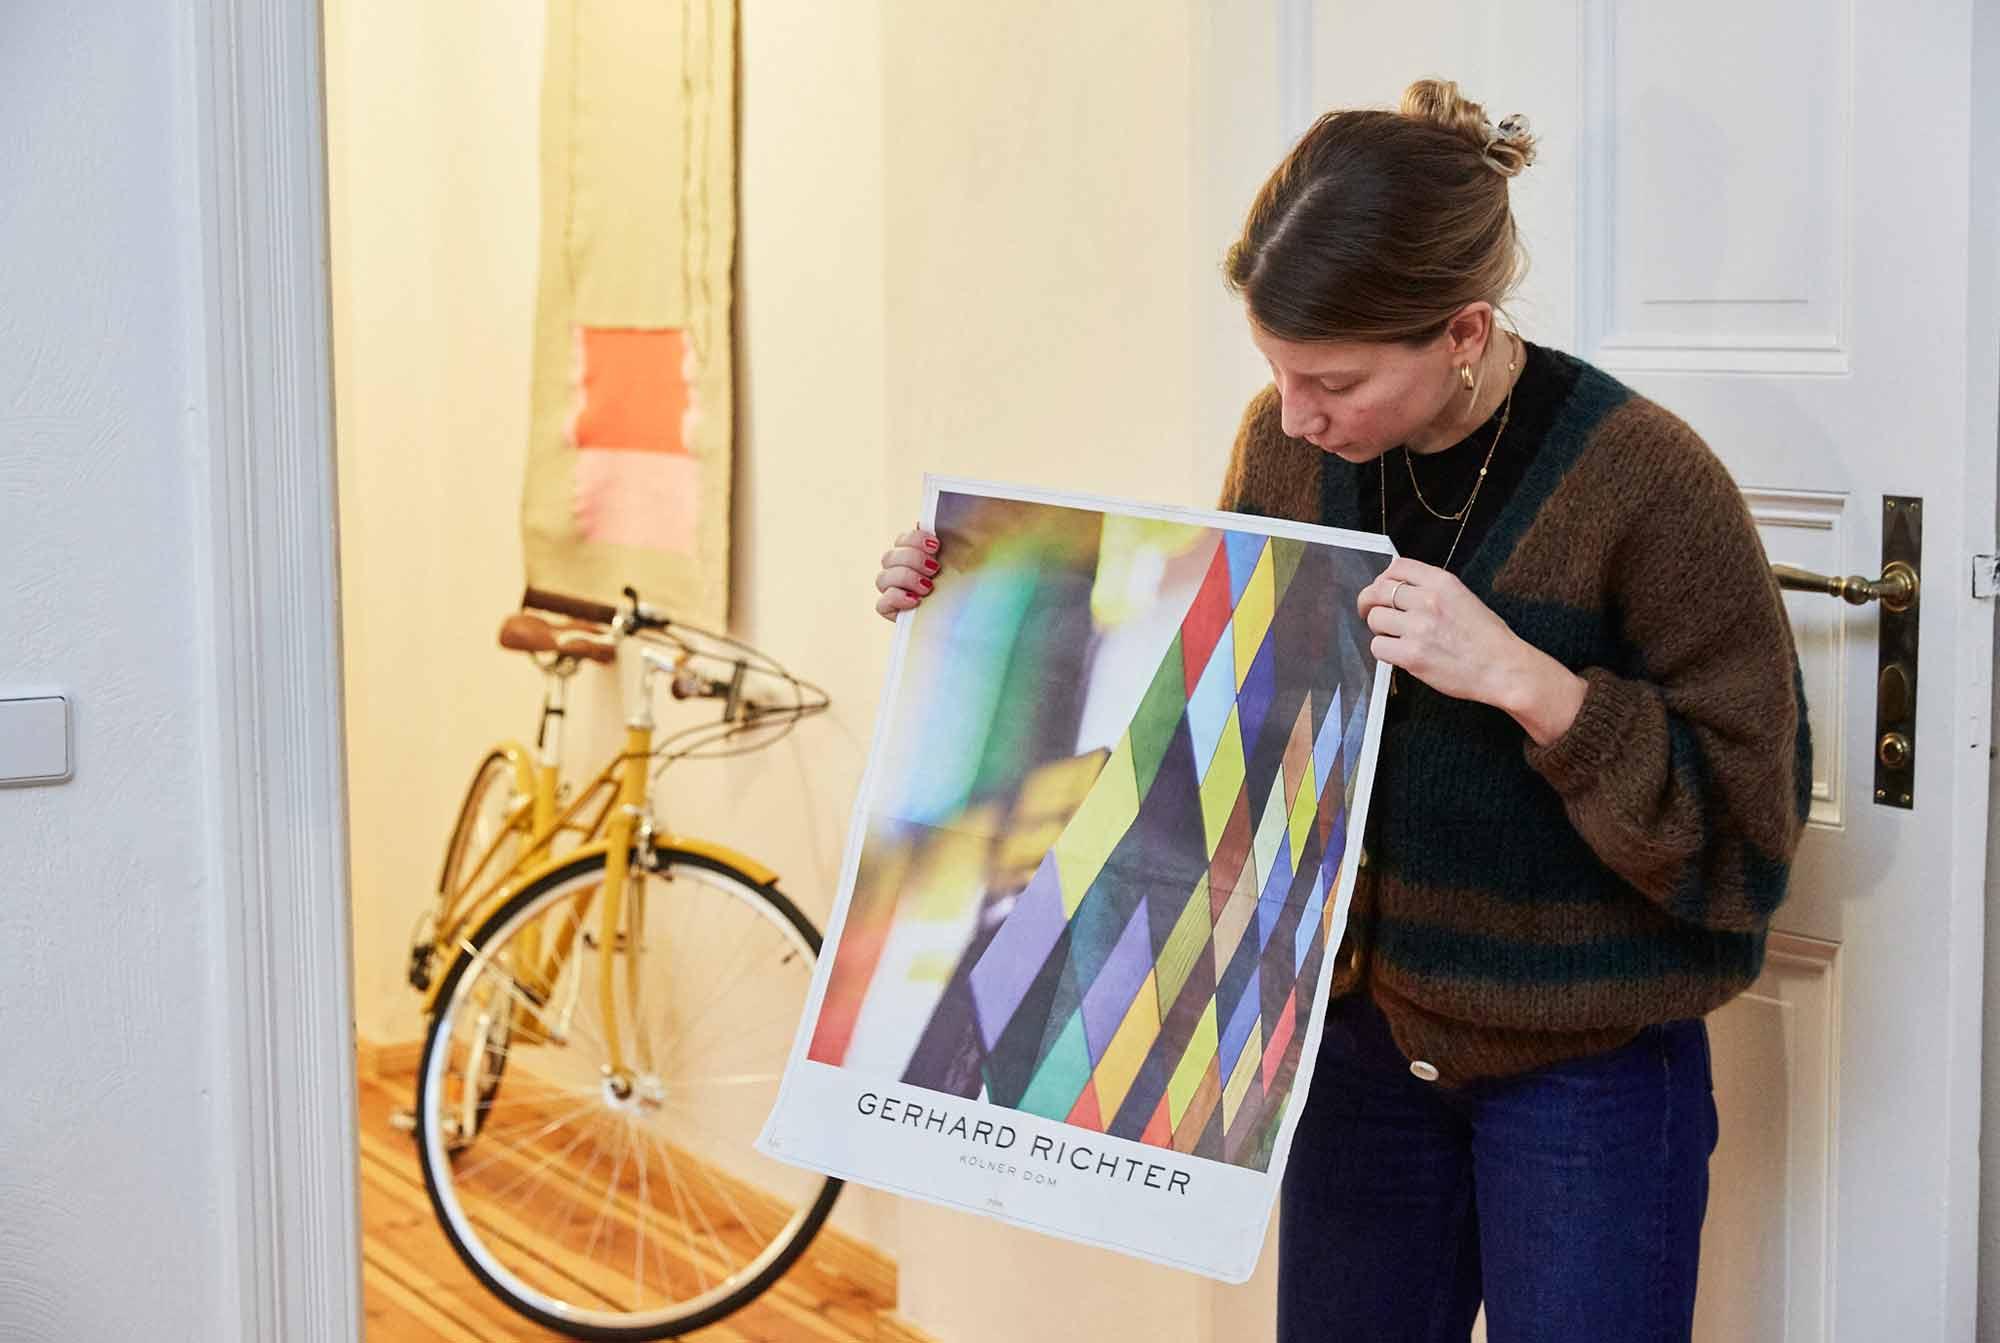 Femtastics_Beige-Magazin-Lisa-Trautmann_26